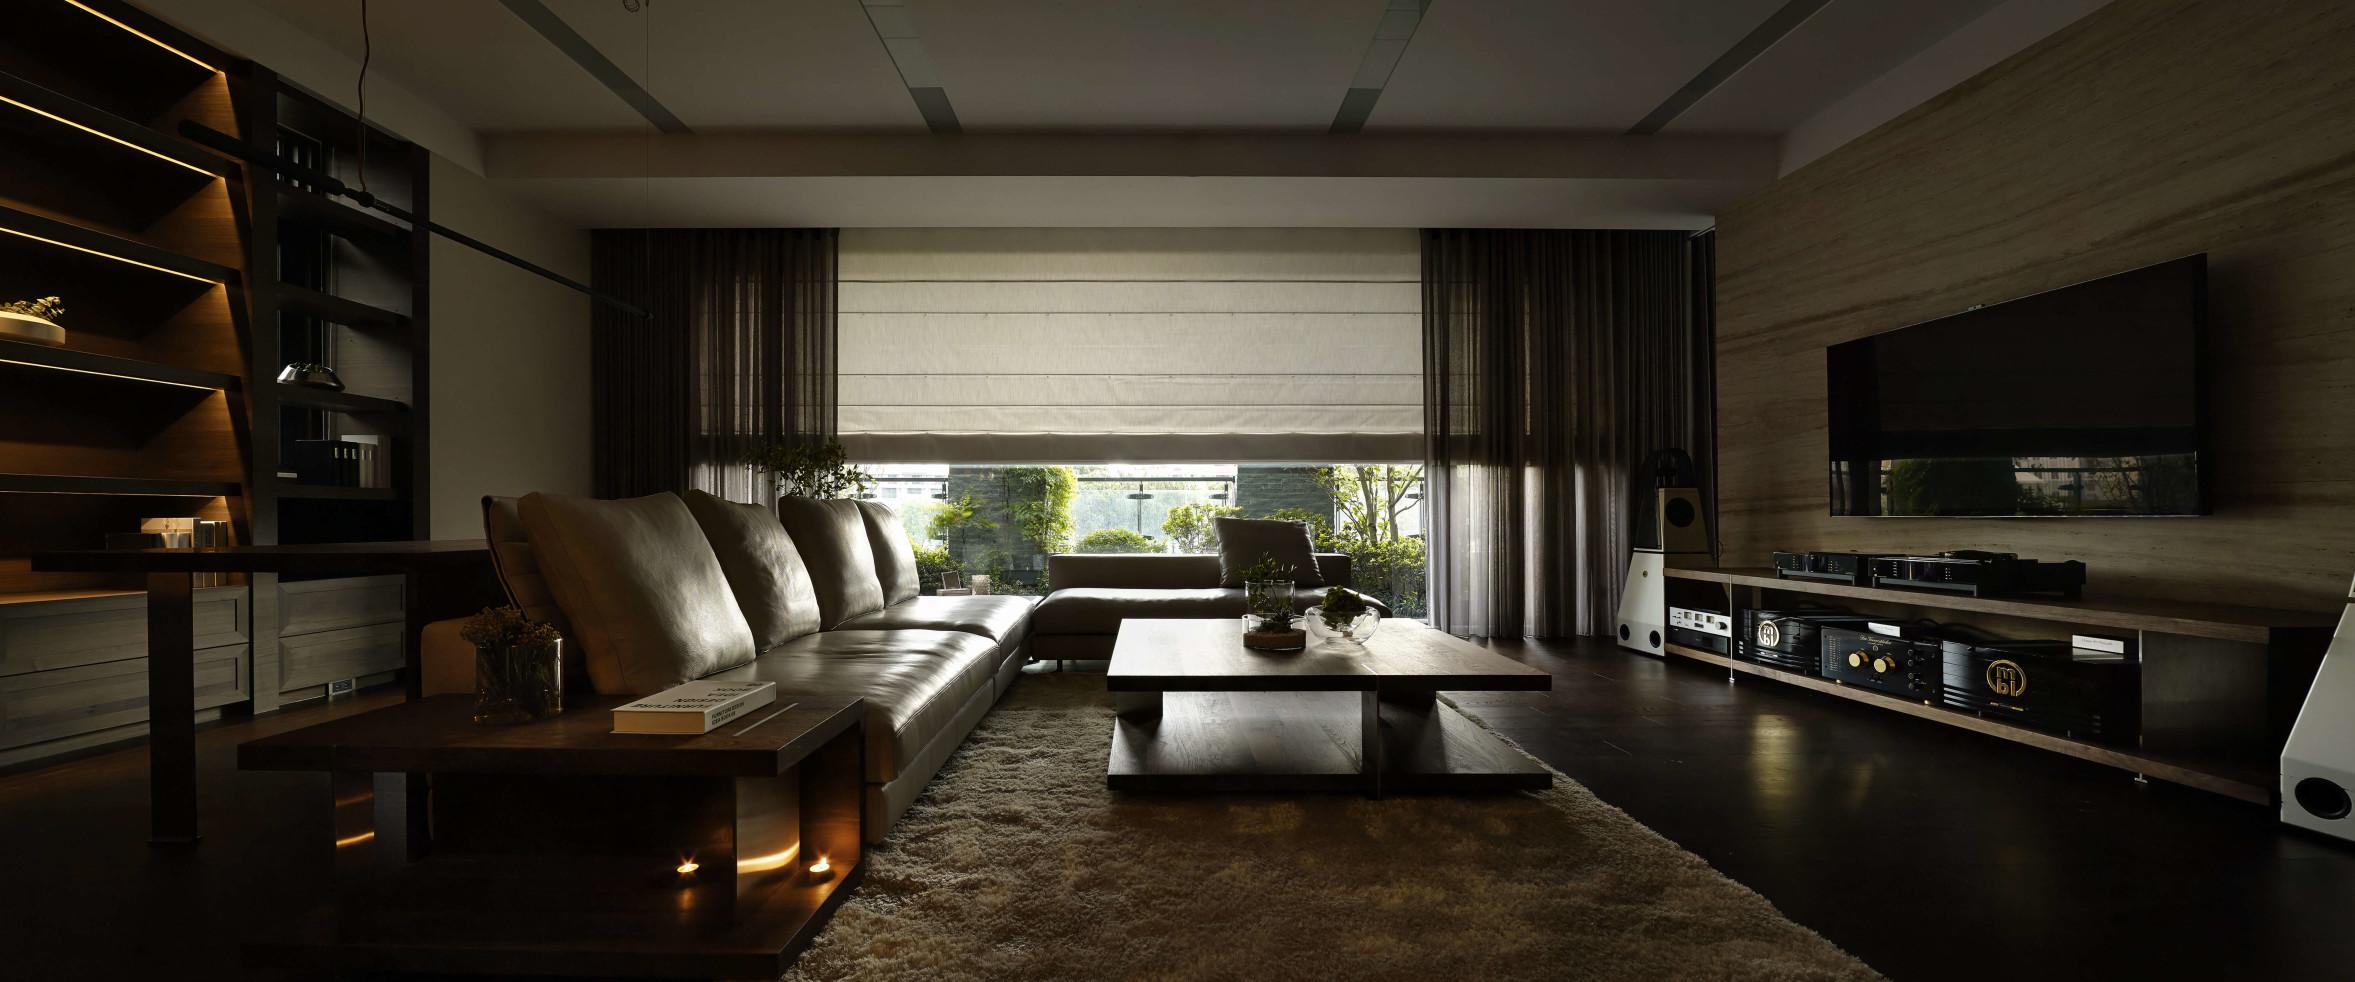 Y House入圍 INSIDE(World Festival of Interiors)世界室內設計節1-分子室內裝修設計公司